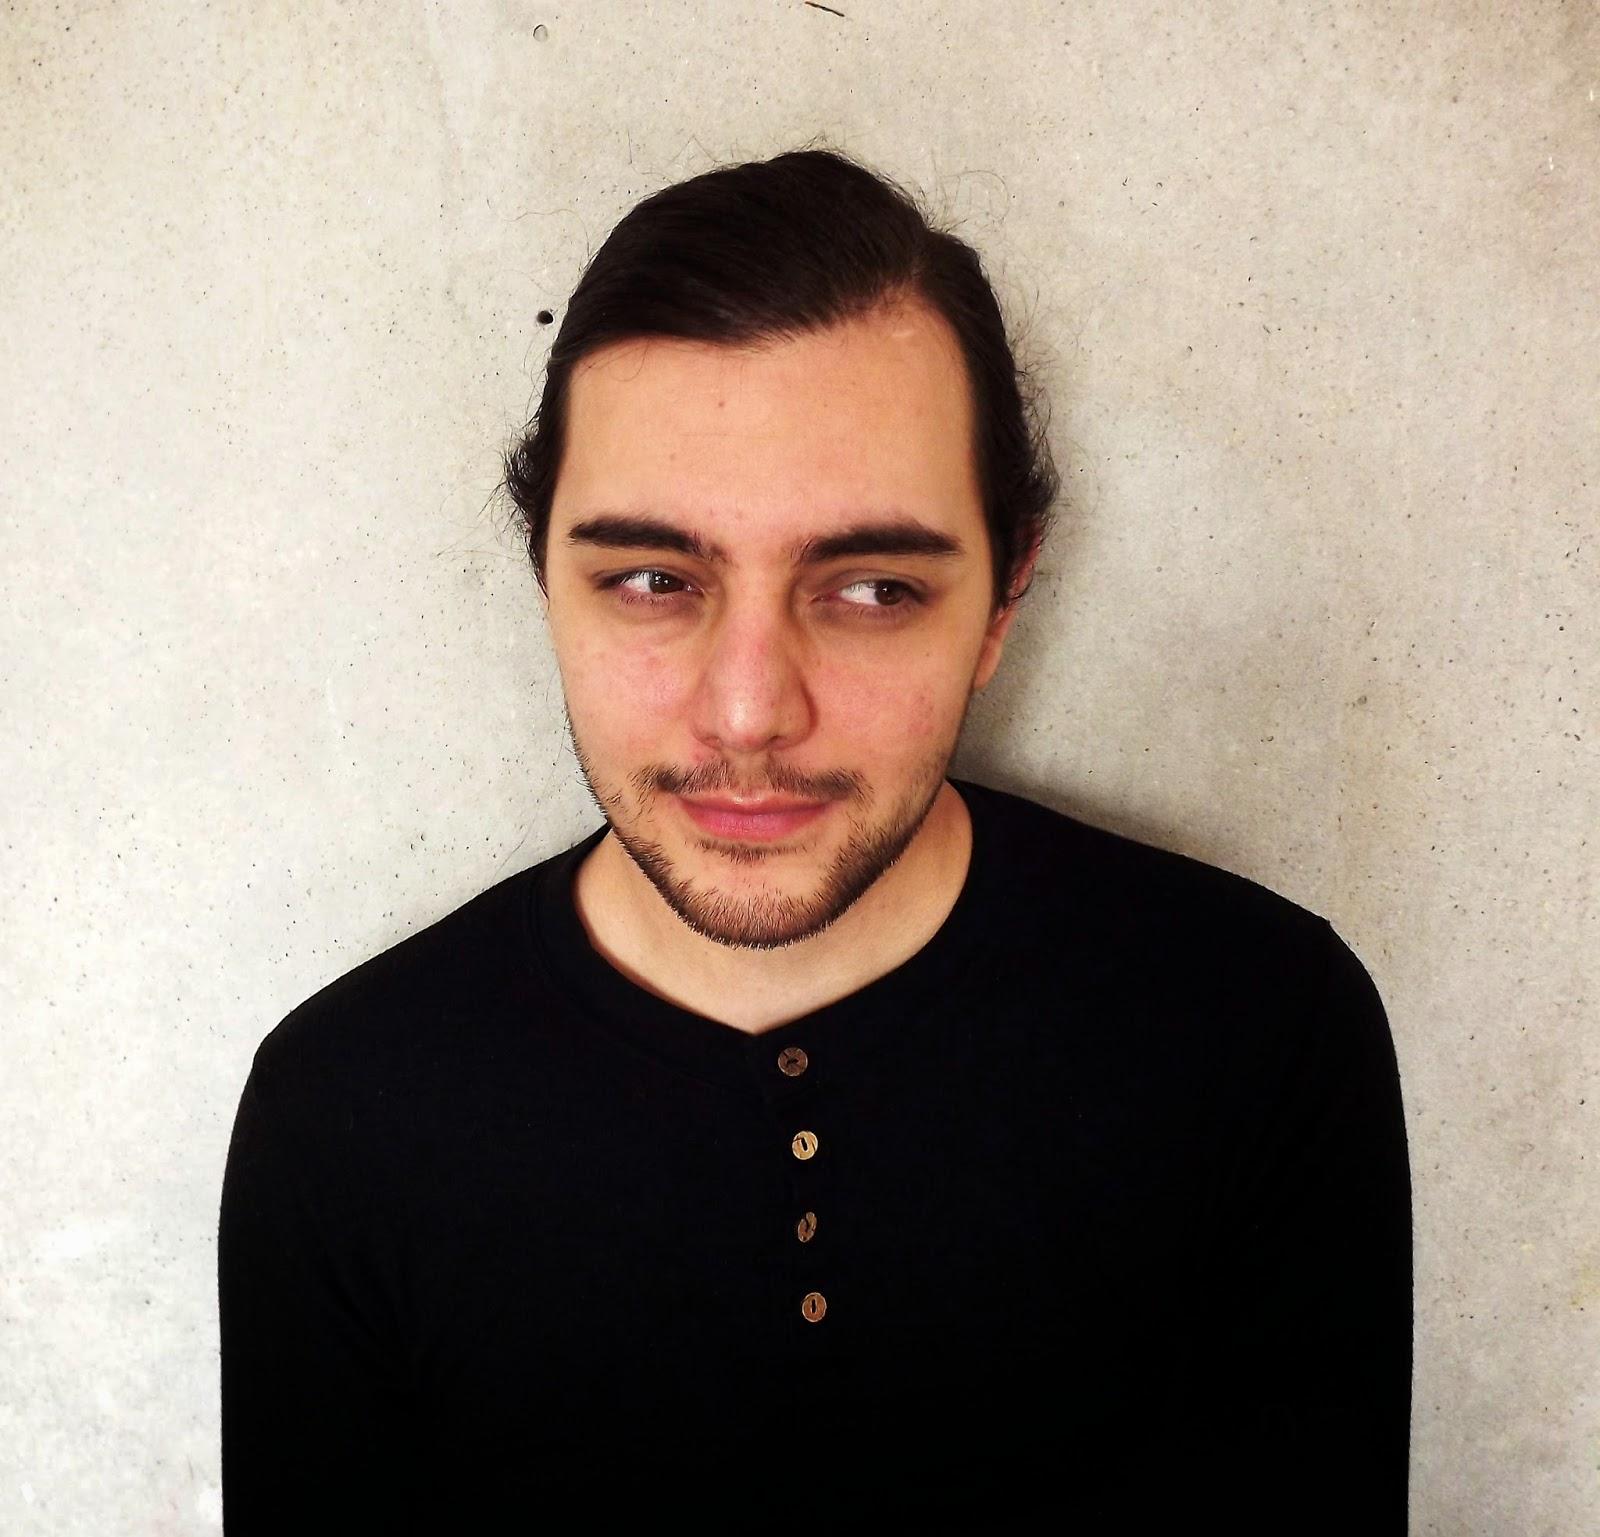 Cesare the Somnambulist Makeup Tutorial